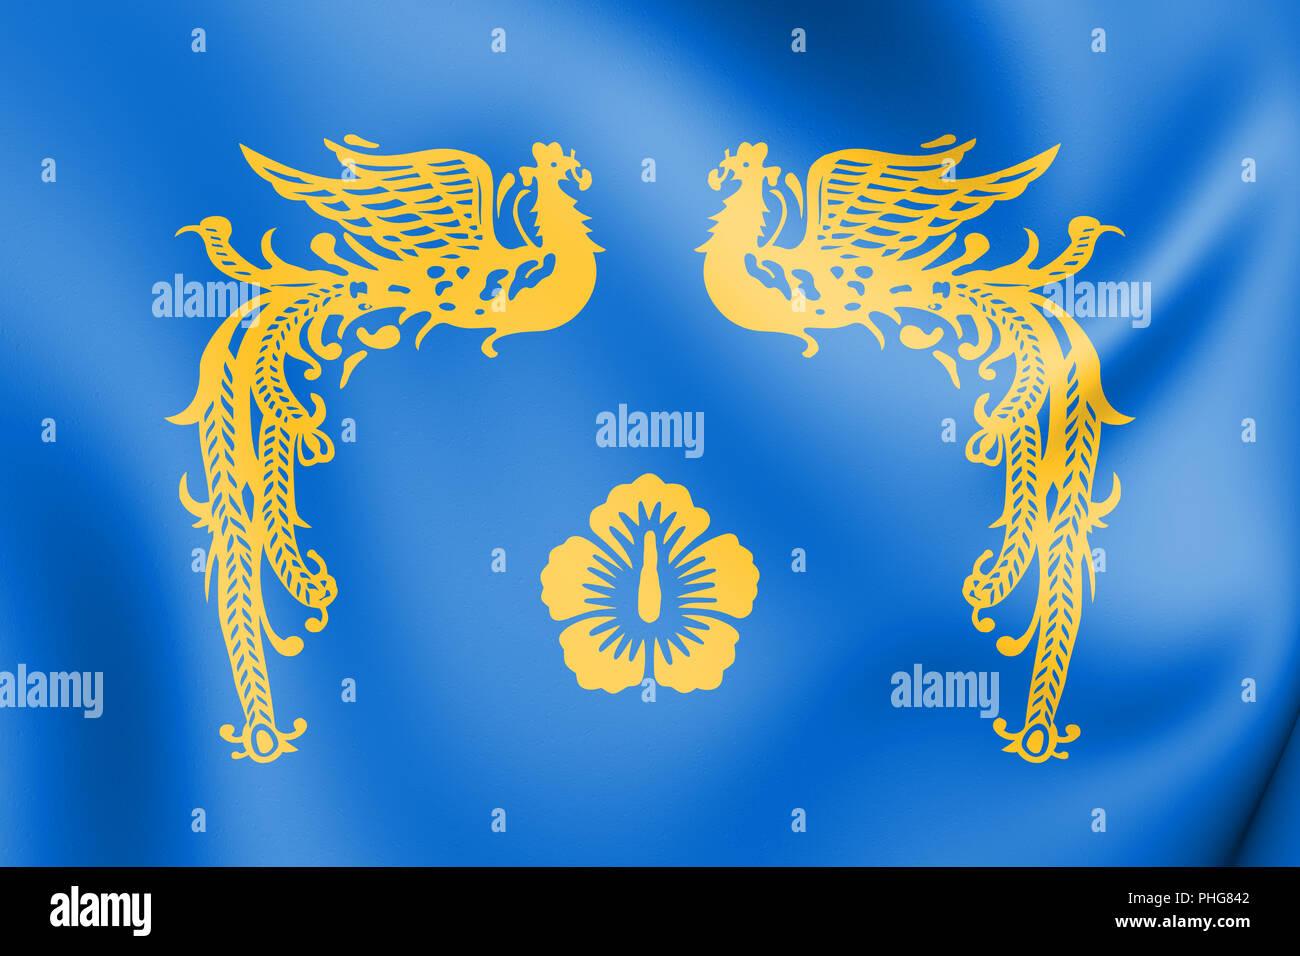 3D Presidential Standard of Republic of Korea. 3D Illustration. Stock Photo